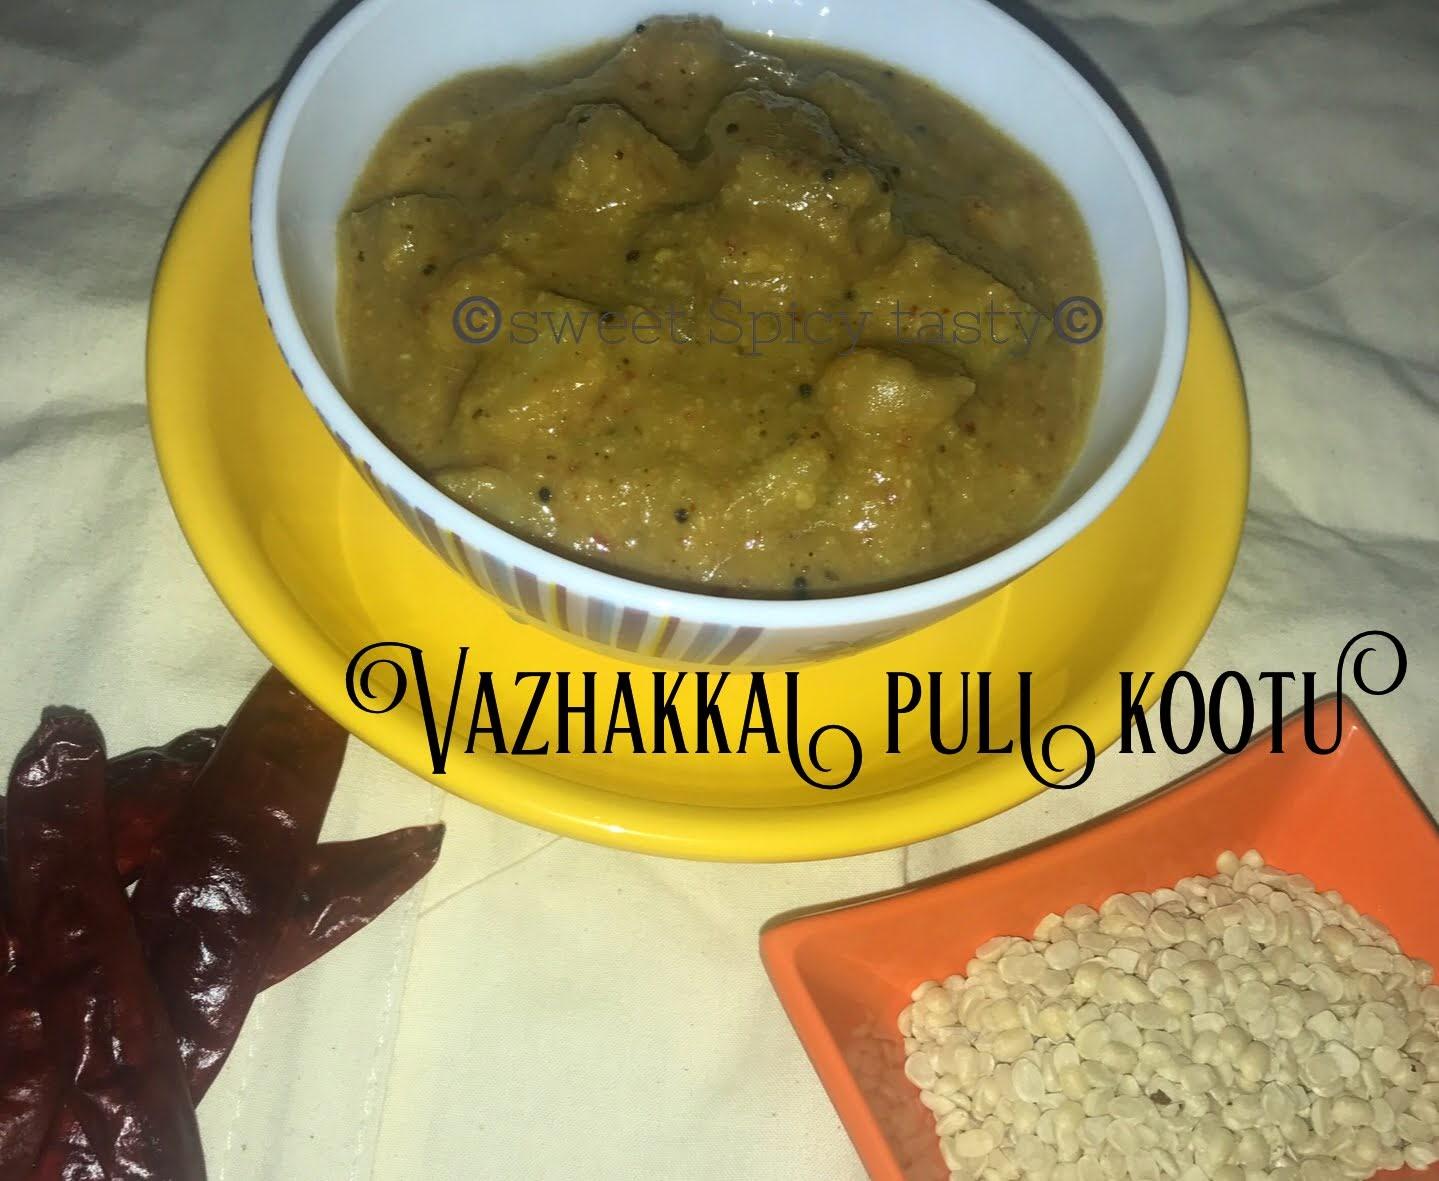 3870e419b3bc handful of boiled chick peas 5-6 tablespoons boiled and mashed thoor dhall    thuvaram paruppu 2-3 tsp sambar powder 1 tsp jaggery powder